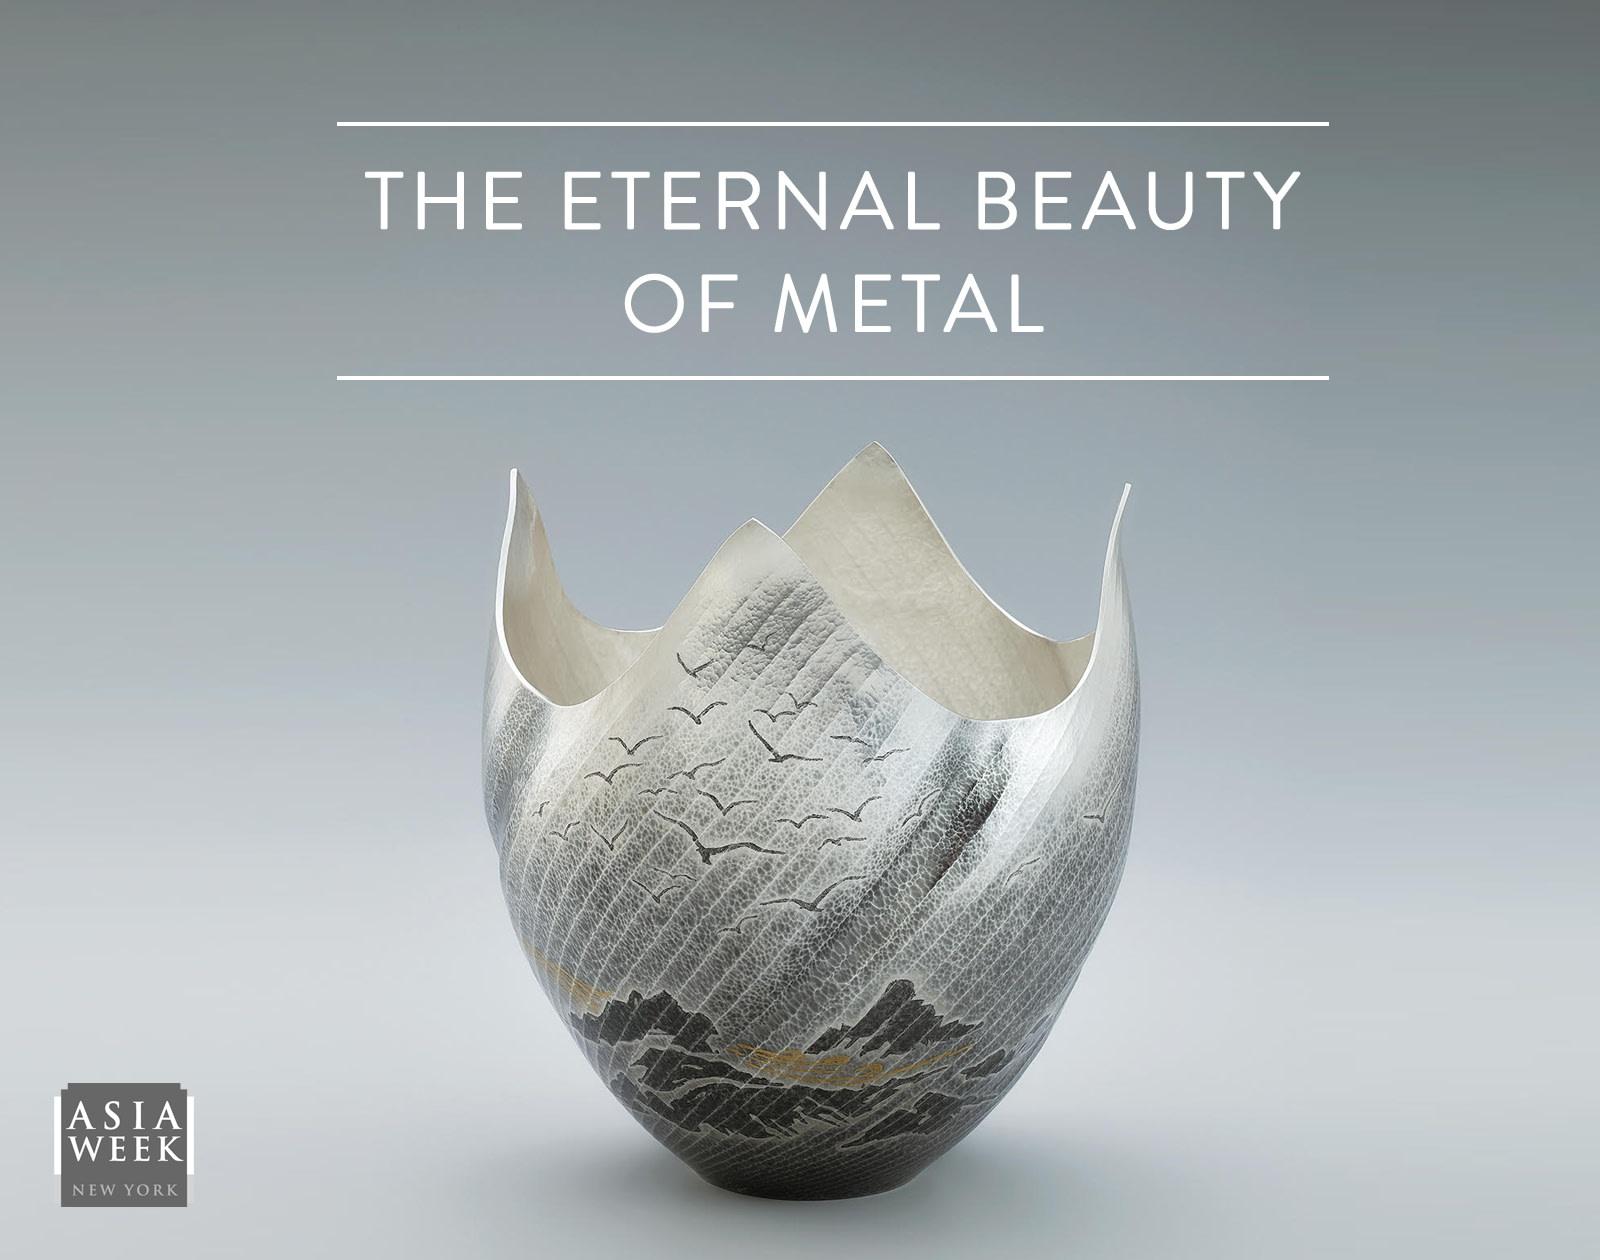 The Eternal Beauty of Metal